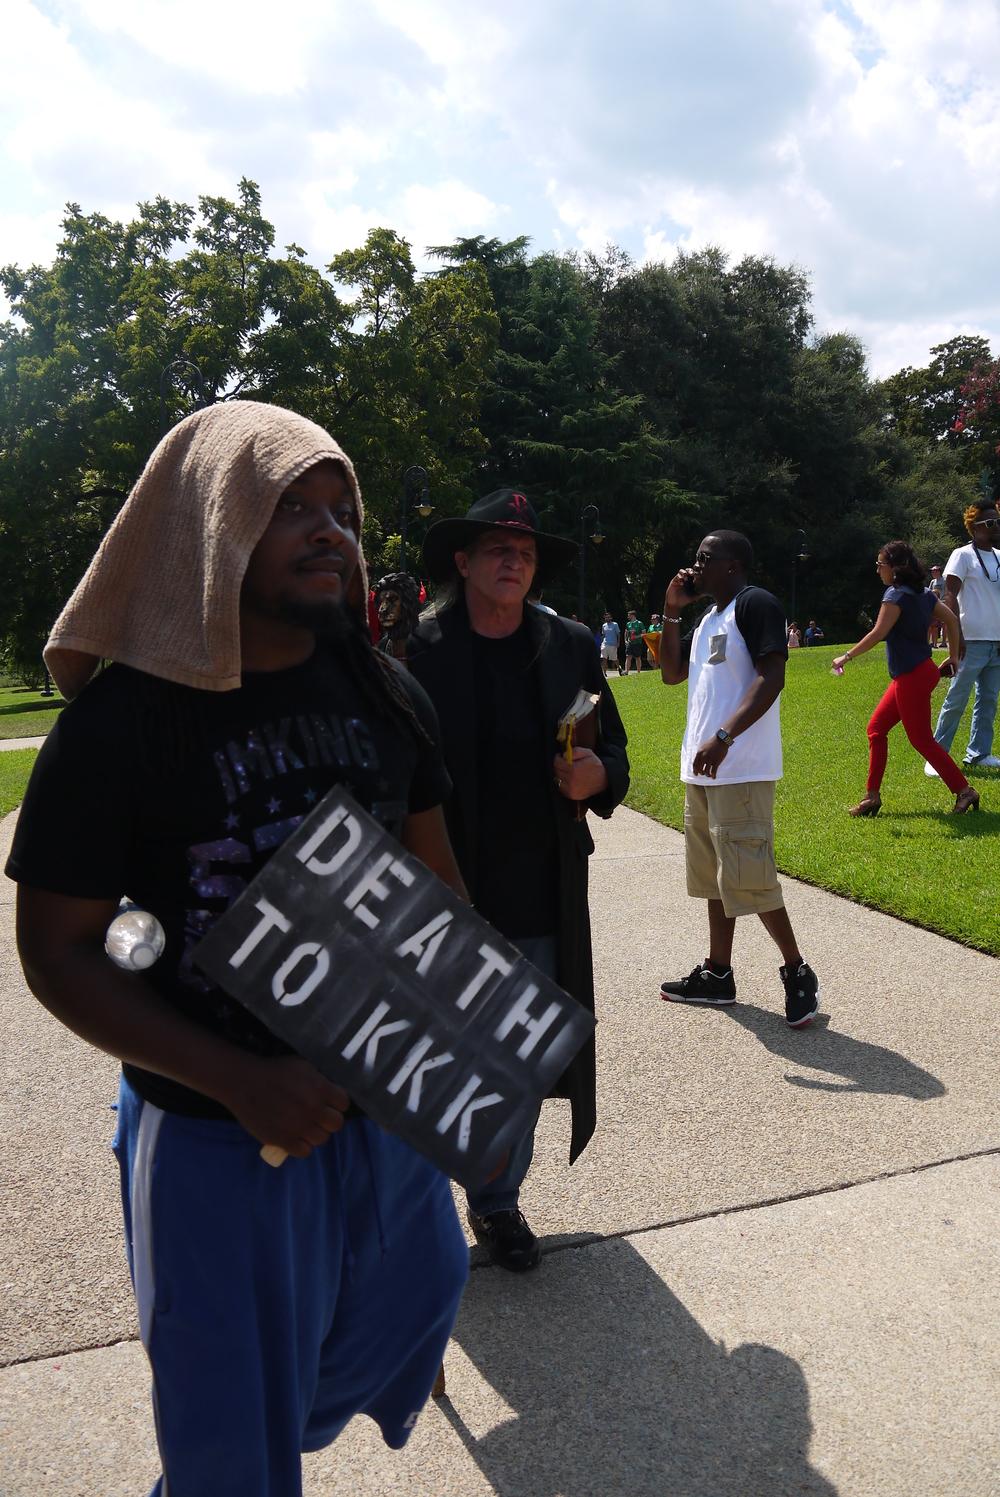 Death to the KKK